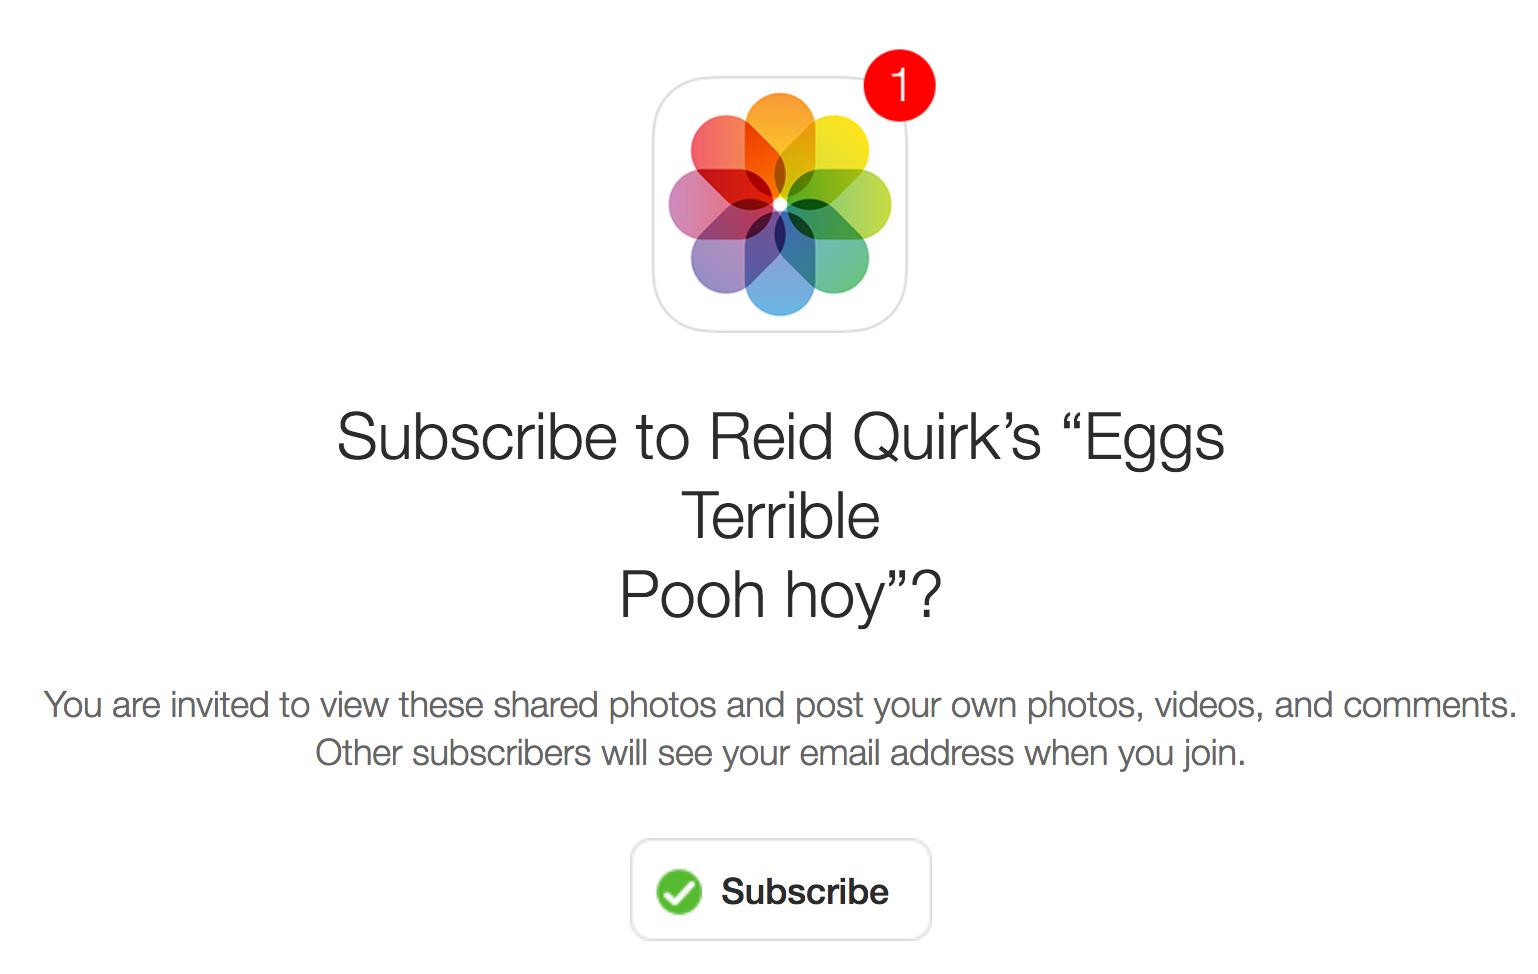 eggs terrible pooh hoy